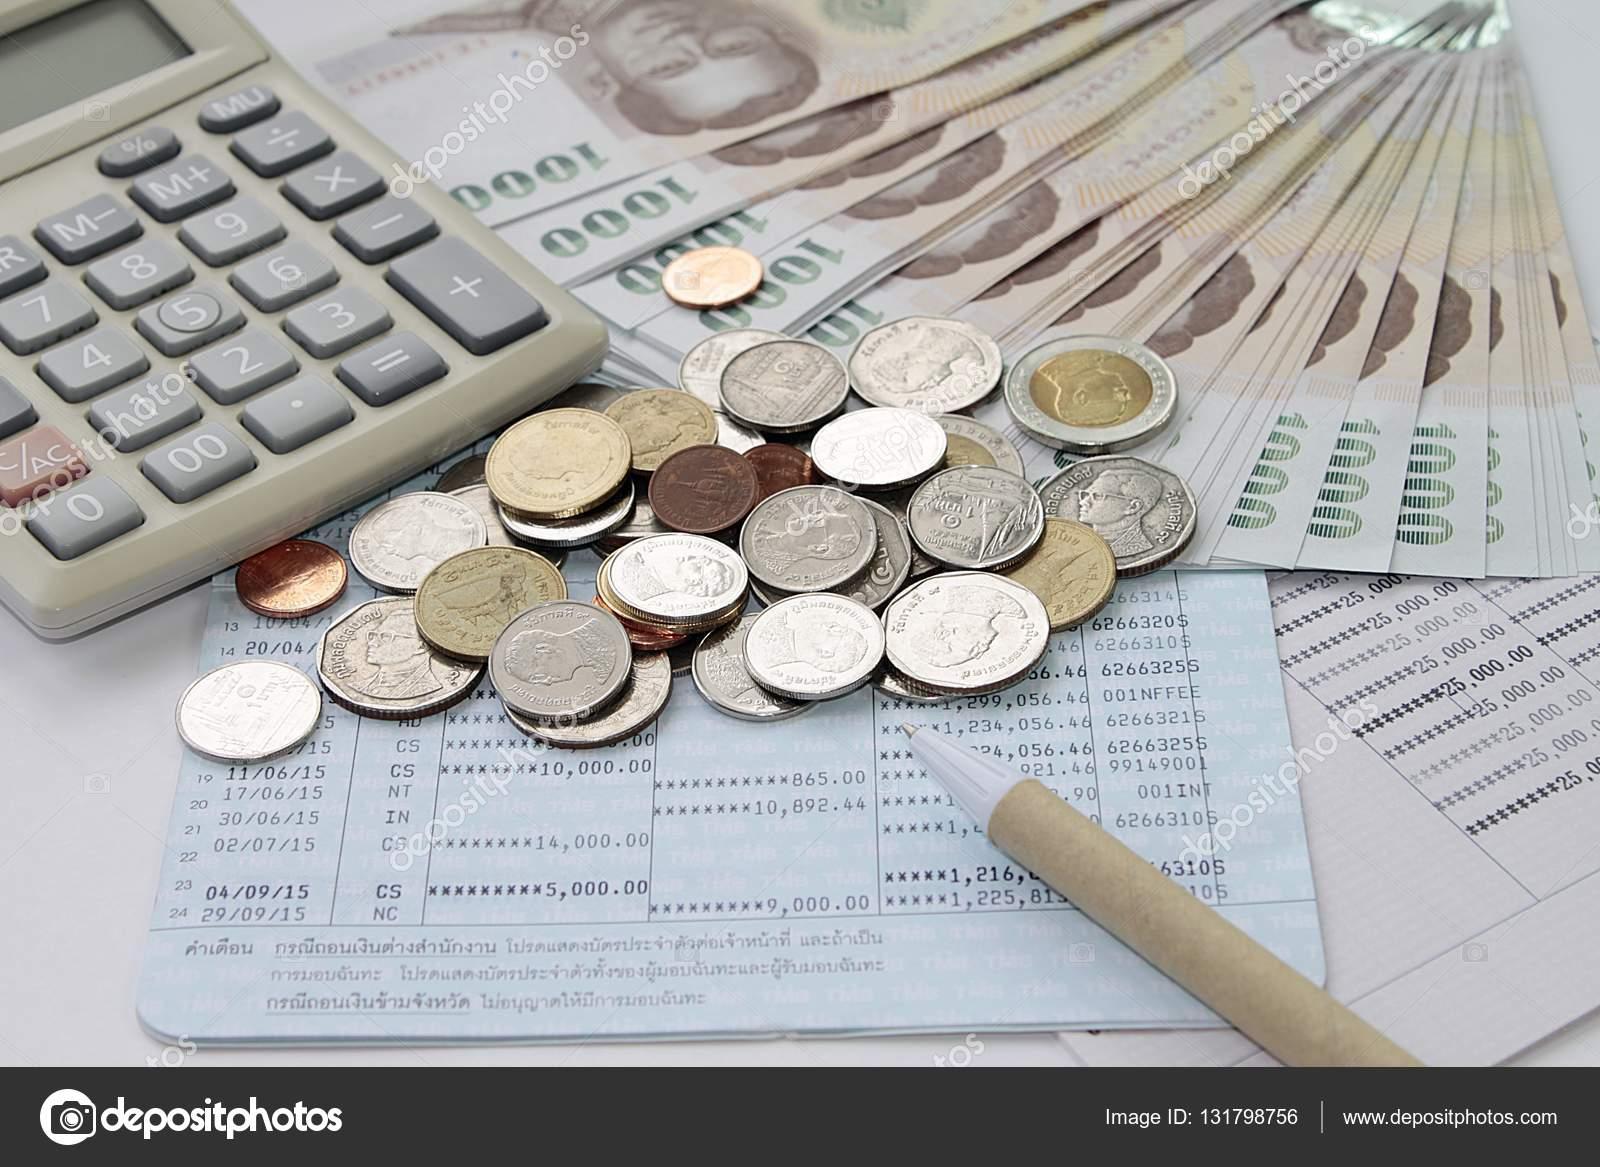 Coins, Thai Baht Money, Calculator And Pen On Savings Account Passbook U2014  Stock Photo